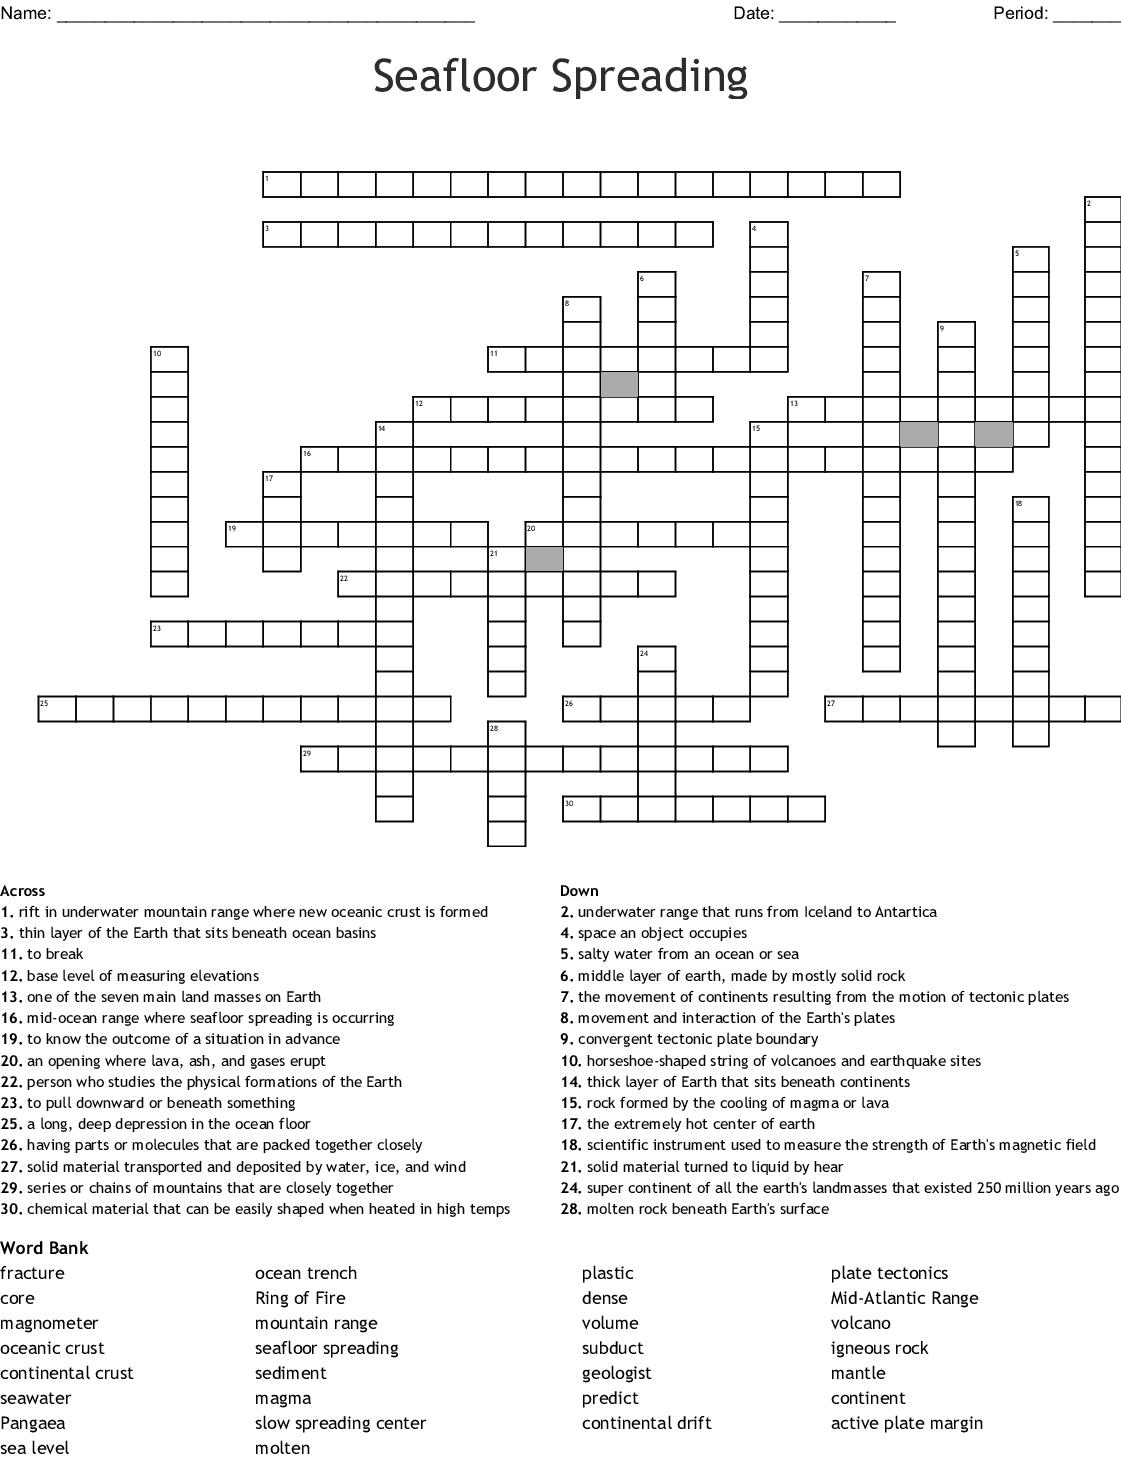 Seafloor Spreading Crossword